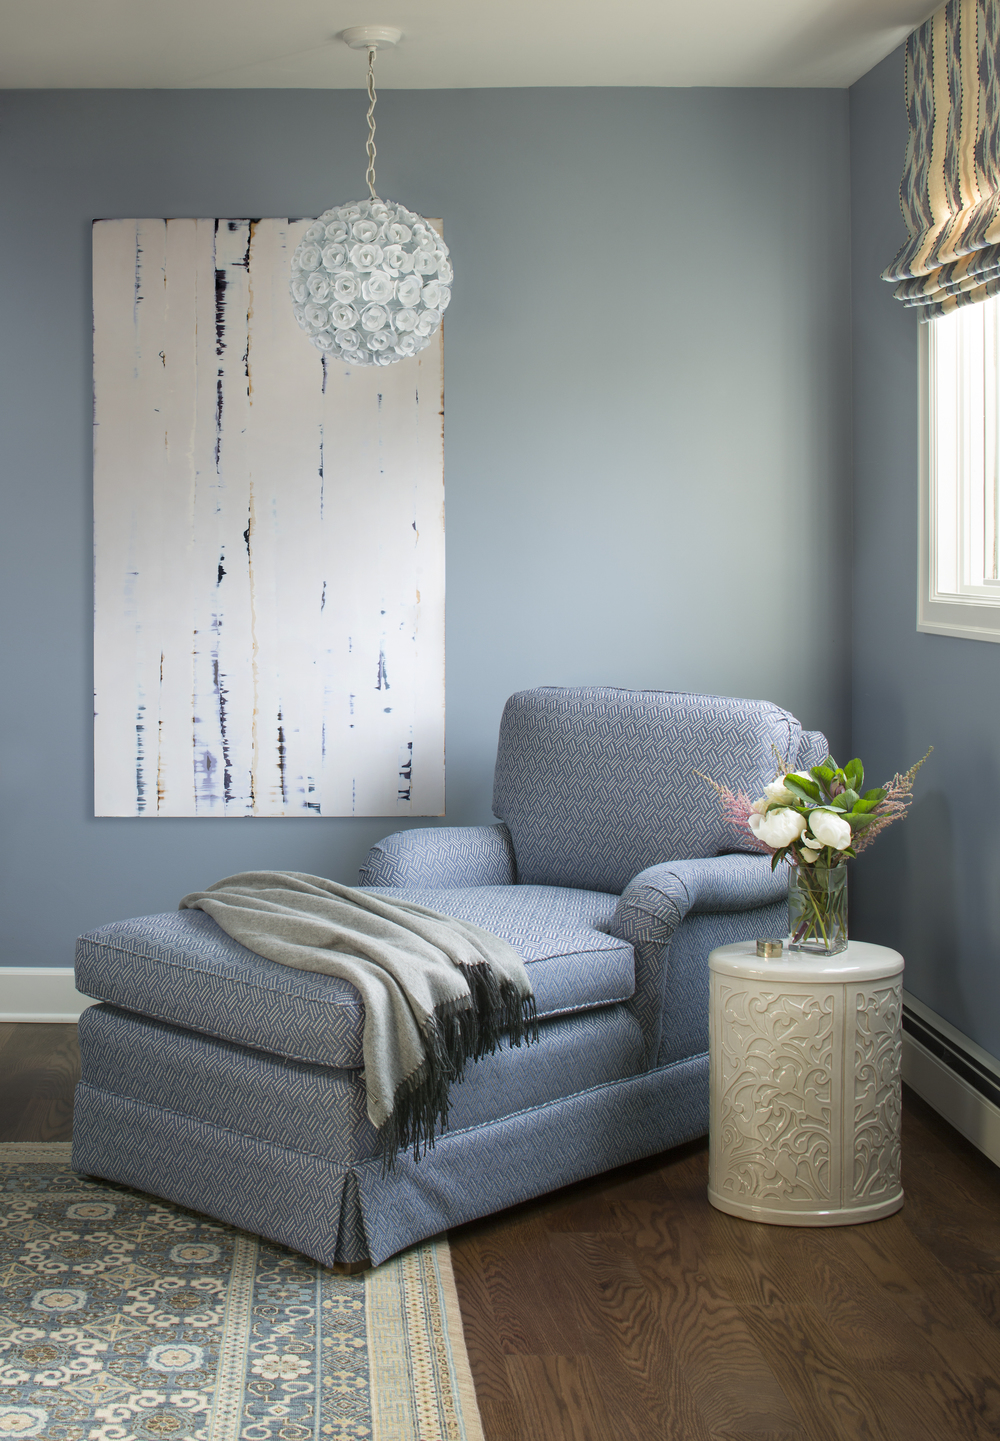 Private Residence. Design: Armijo Design Group . Kimberly Gavin photography.Artist: Chris Richter.